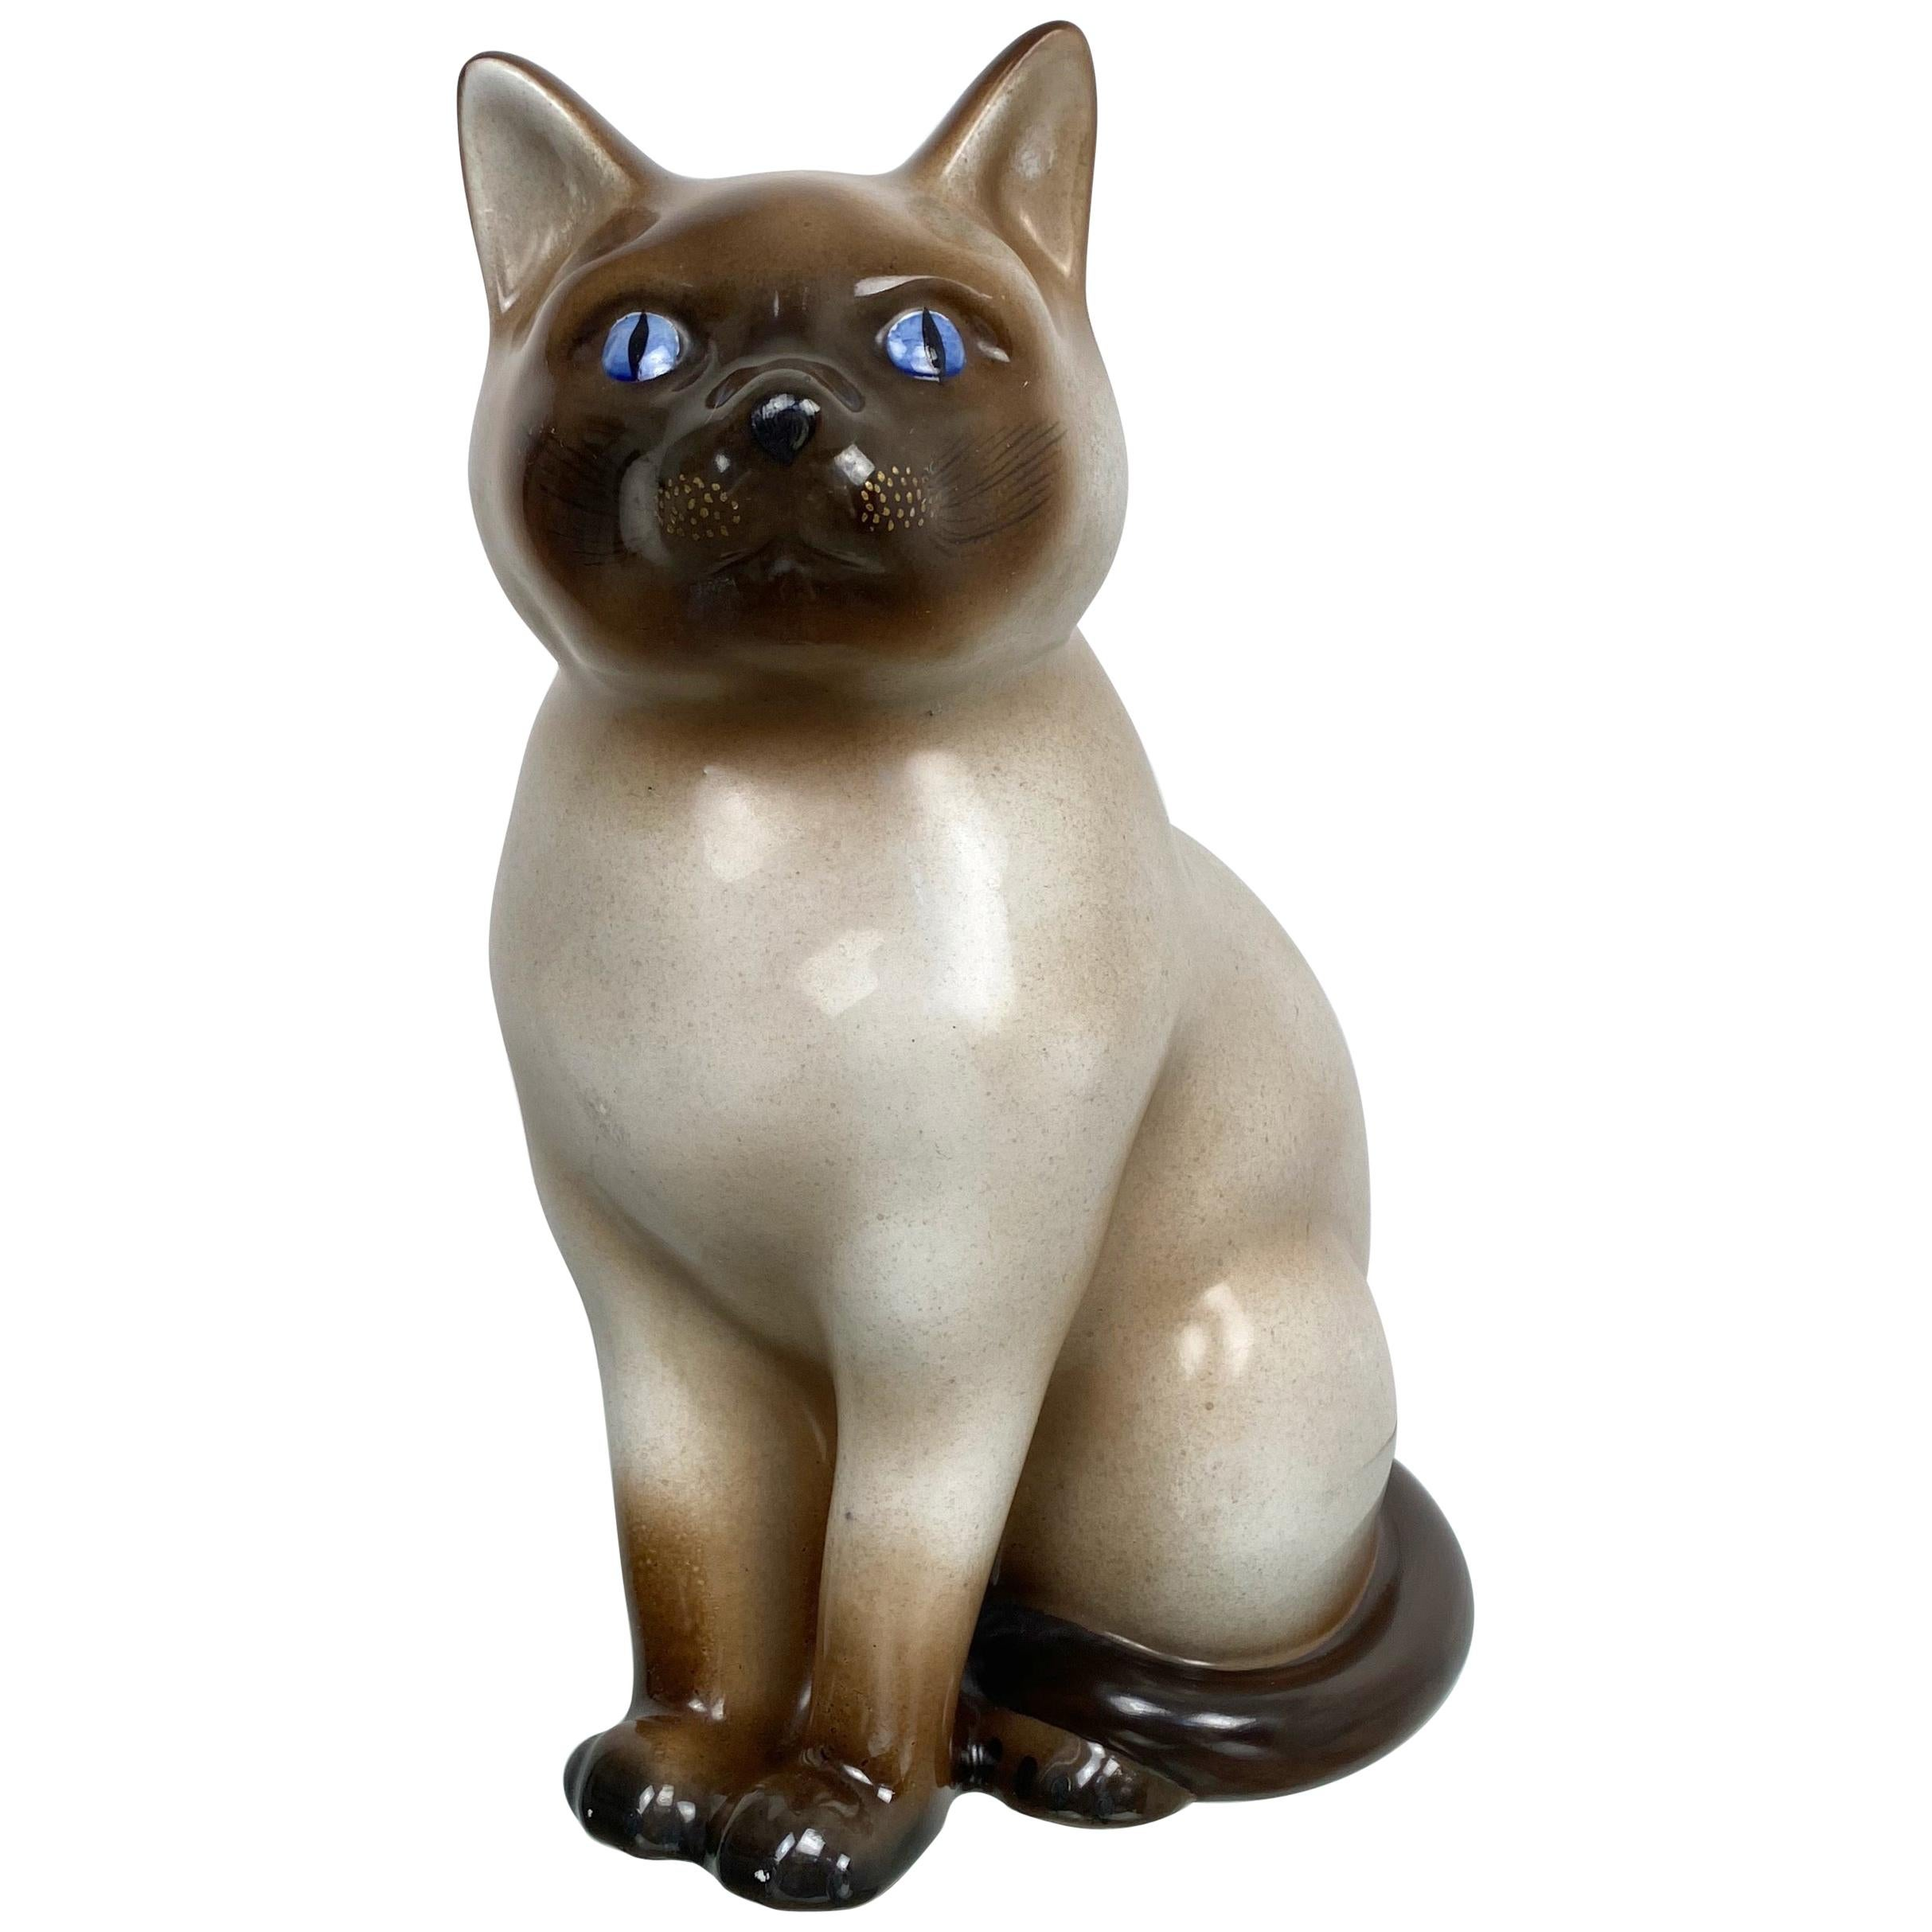 Siamese Cat Vintage Ceramic Sculpture by Piero Fornasetti 1960s Italy